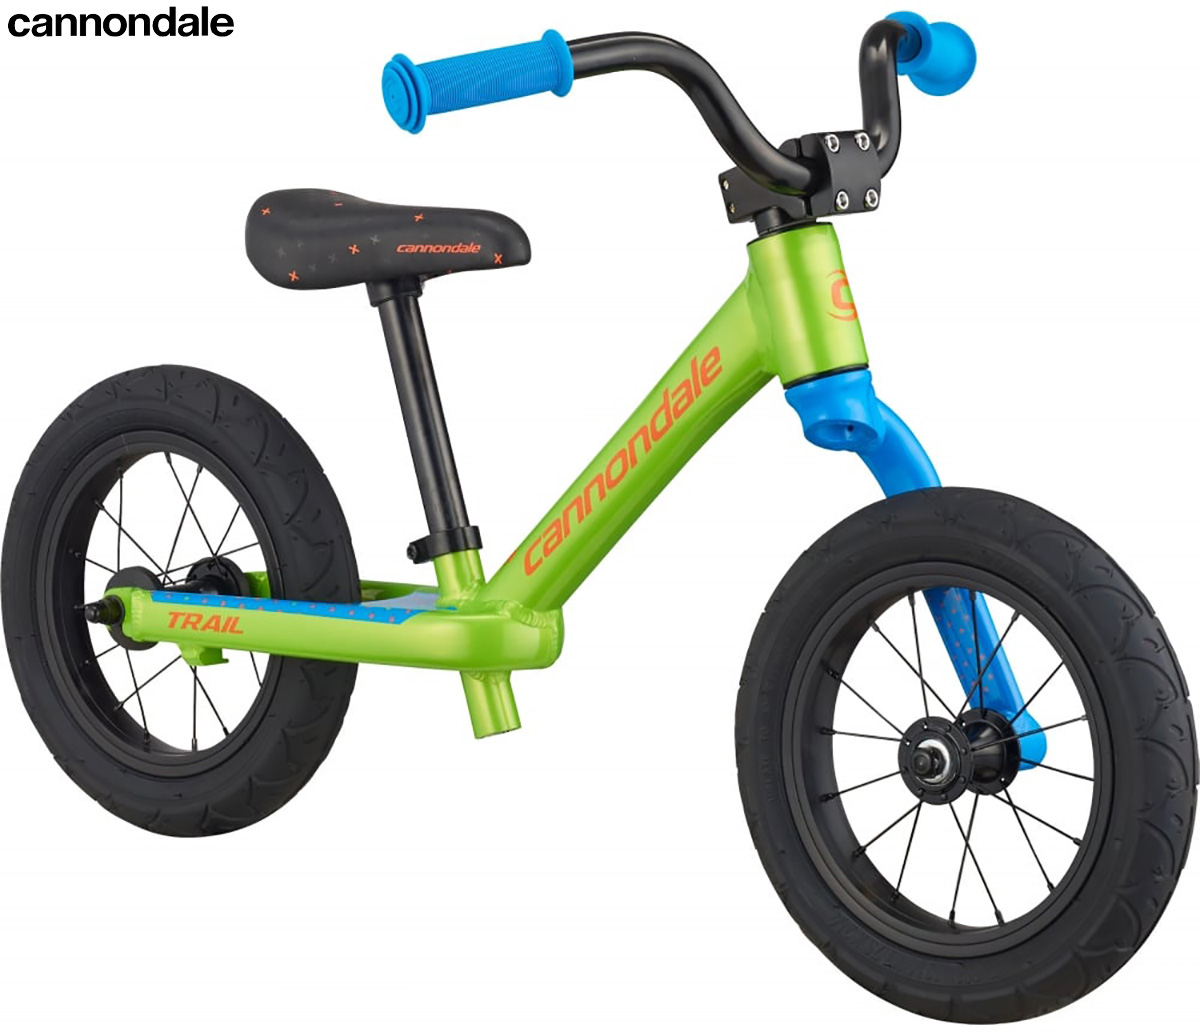 La bici per bambini senza pedali Cannondale Trail Balance Bike